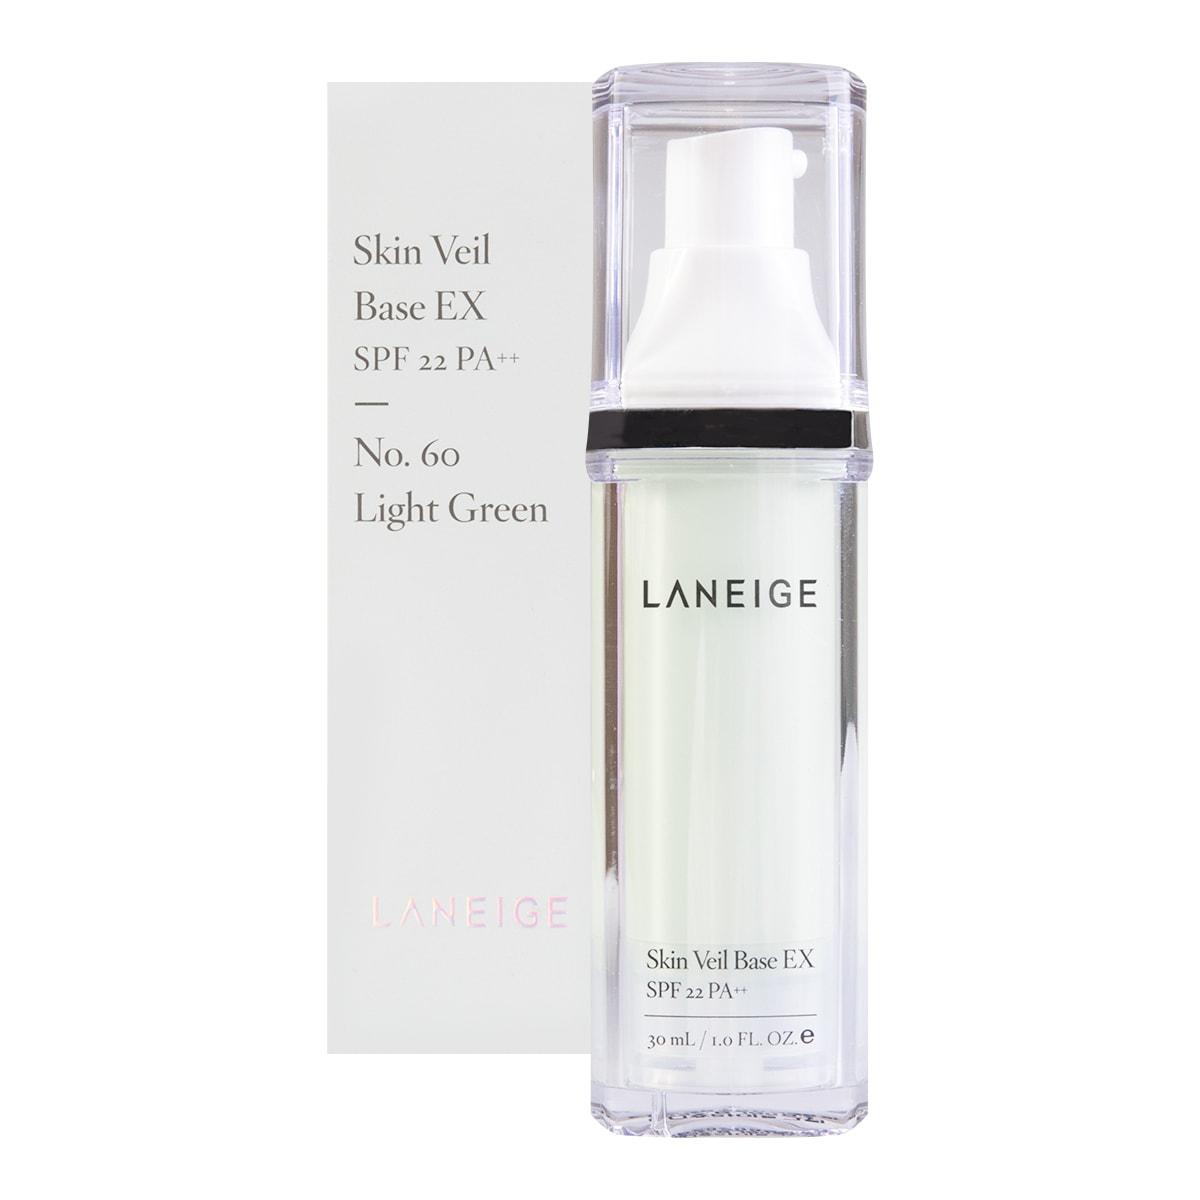 Laneige Lip Eye Make Up Remover Waterproof Ex 25ml Skin Veil Base No60 Light Green Spf22 Pa 30ml